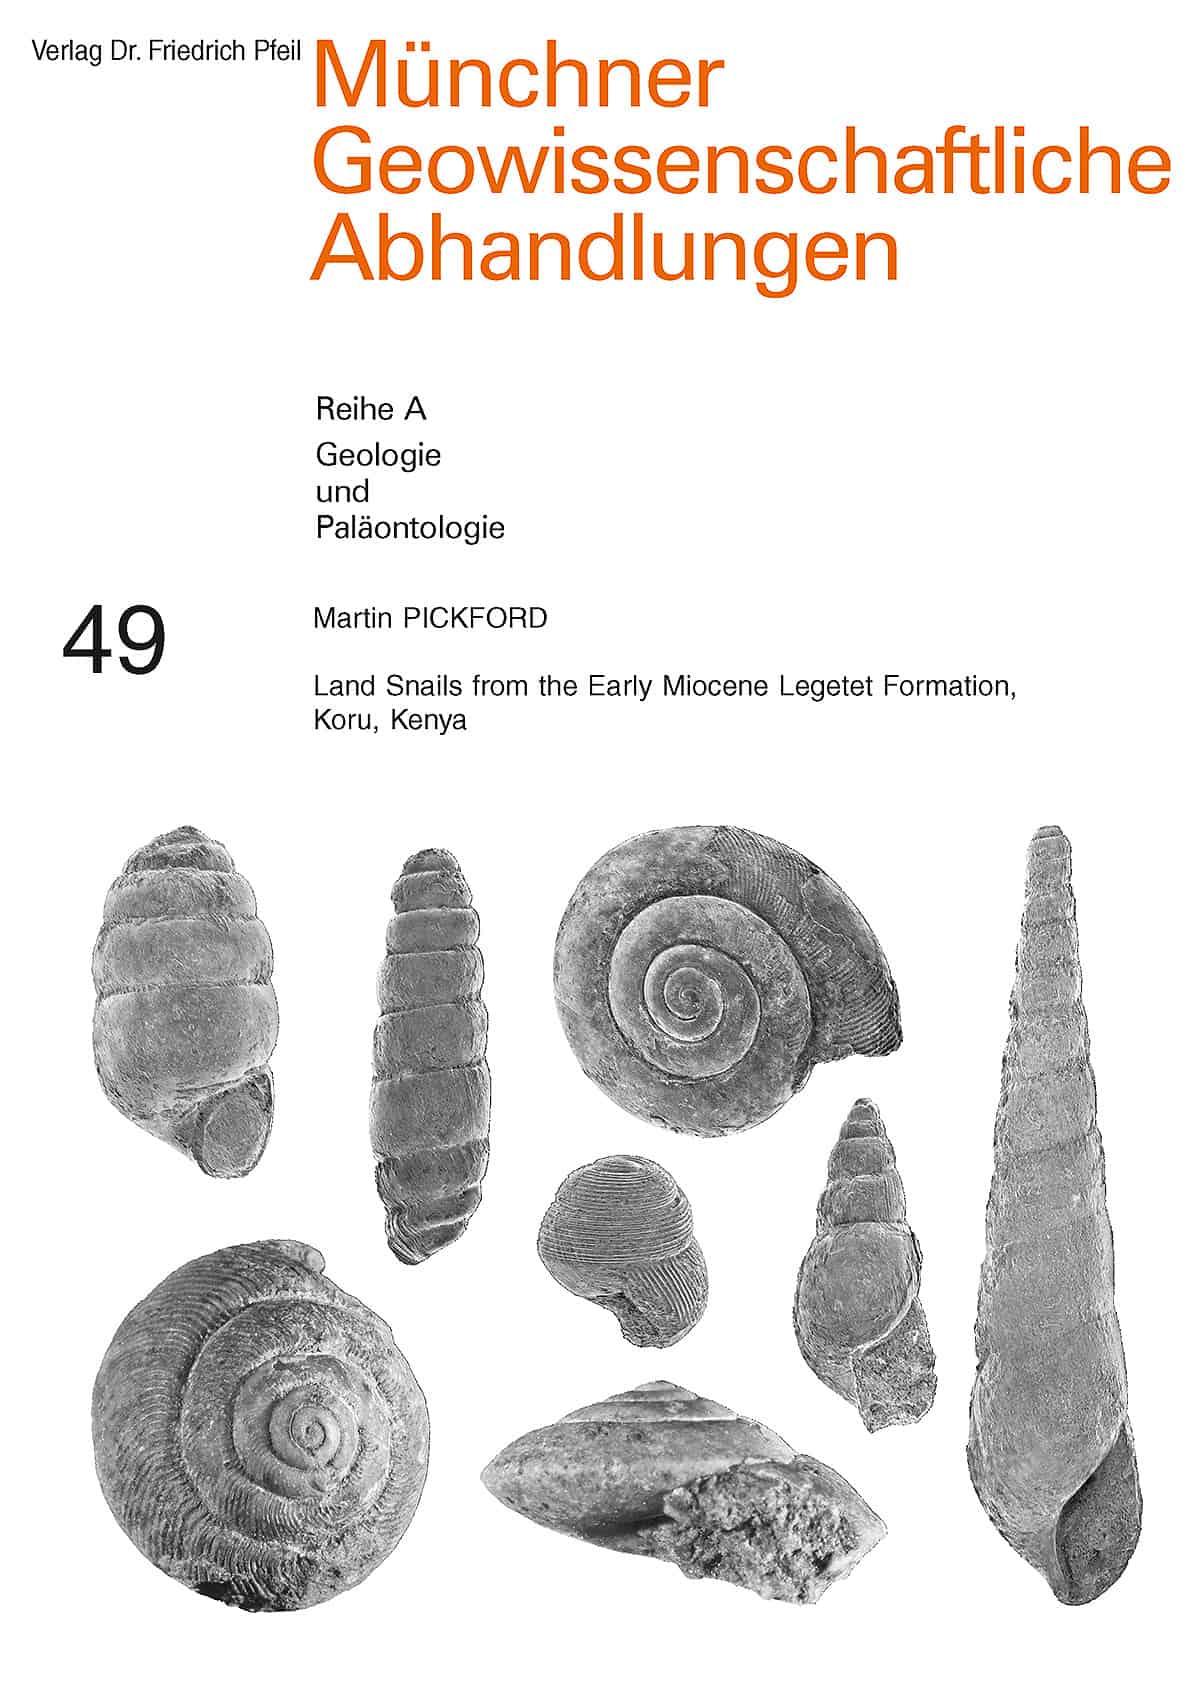 Land Snails from the Early Miocene Legetet Formation, Koru, Kenya